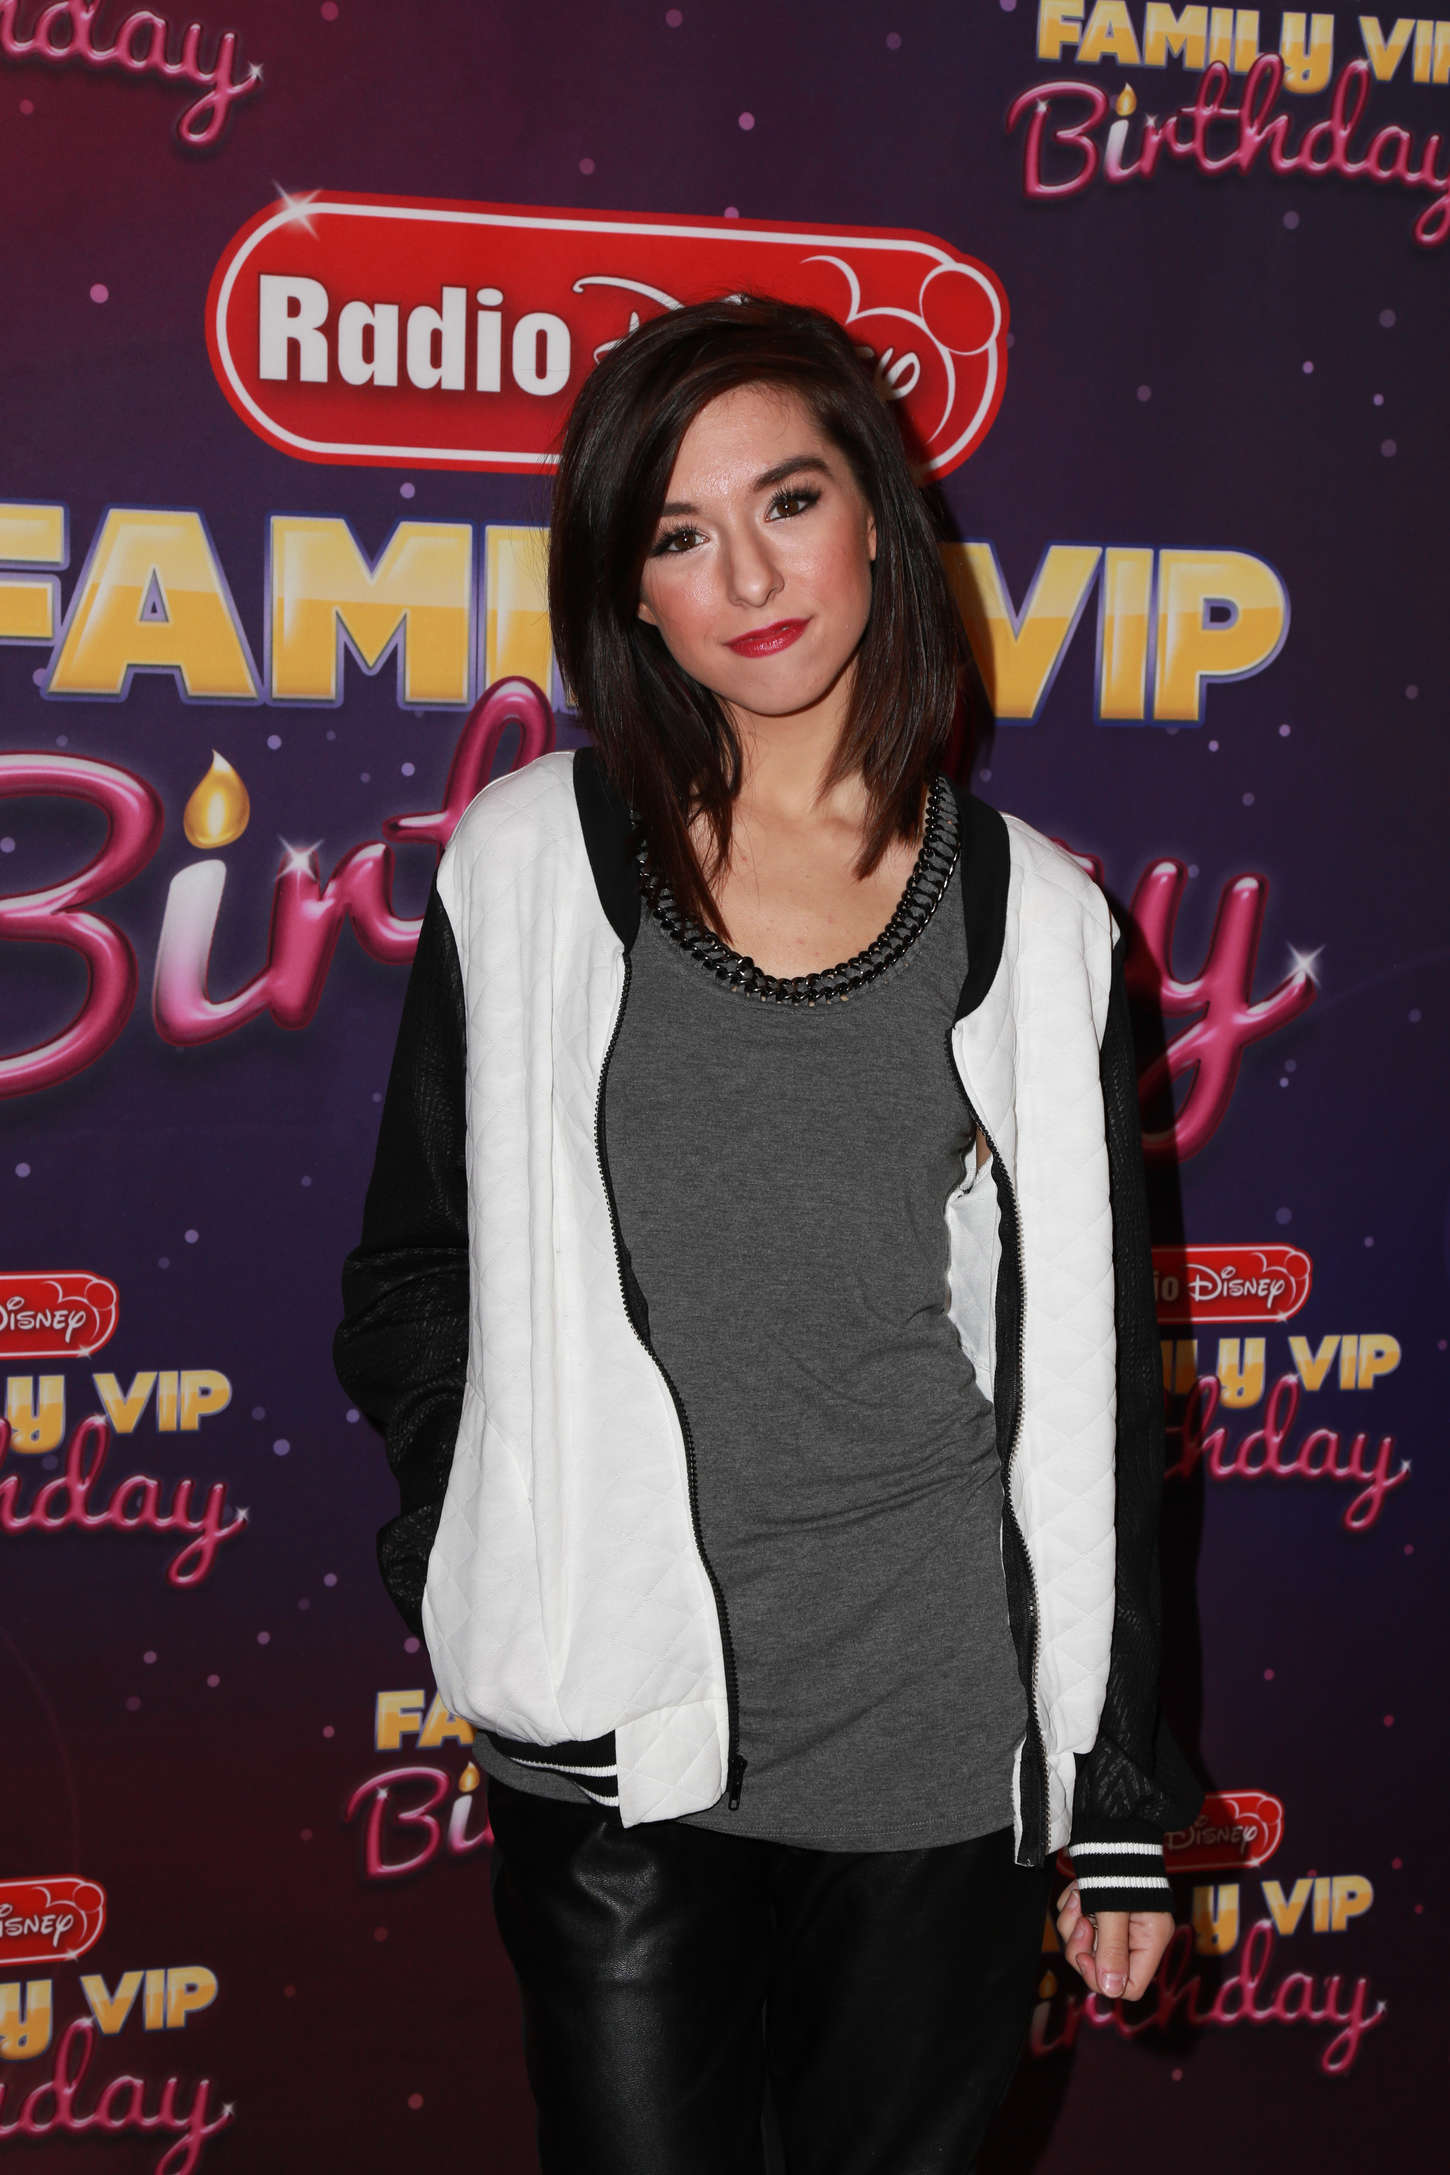 Christina Grimmie attends Radio Disney's Family VIP Birthday